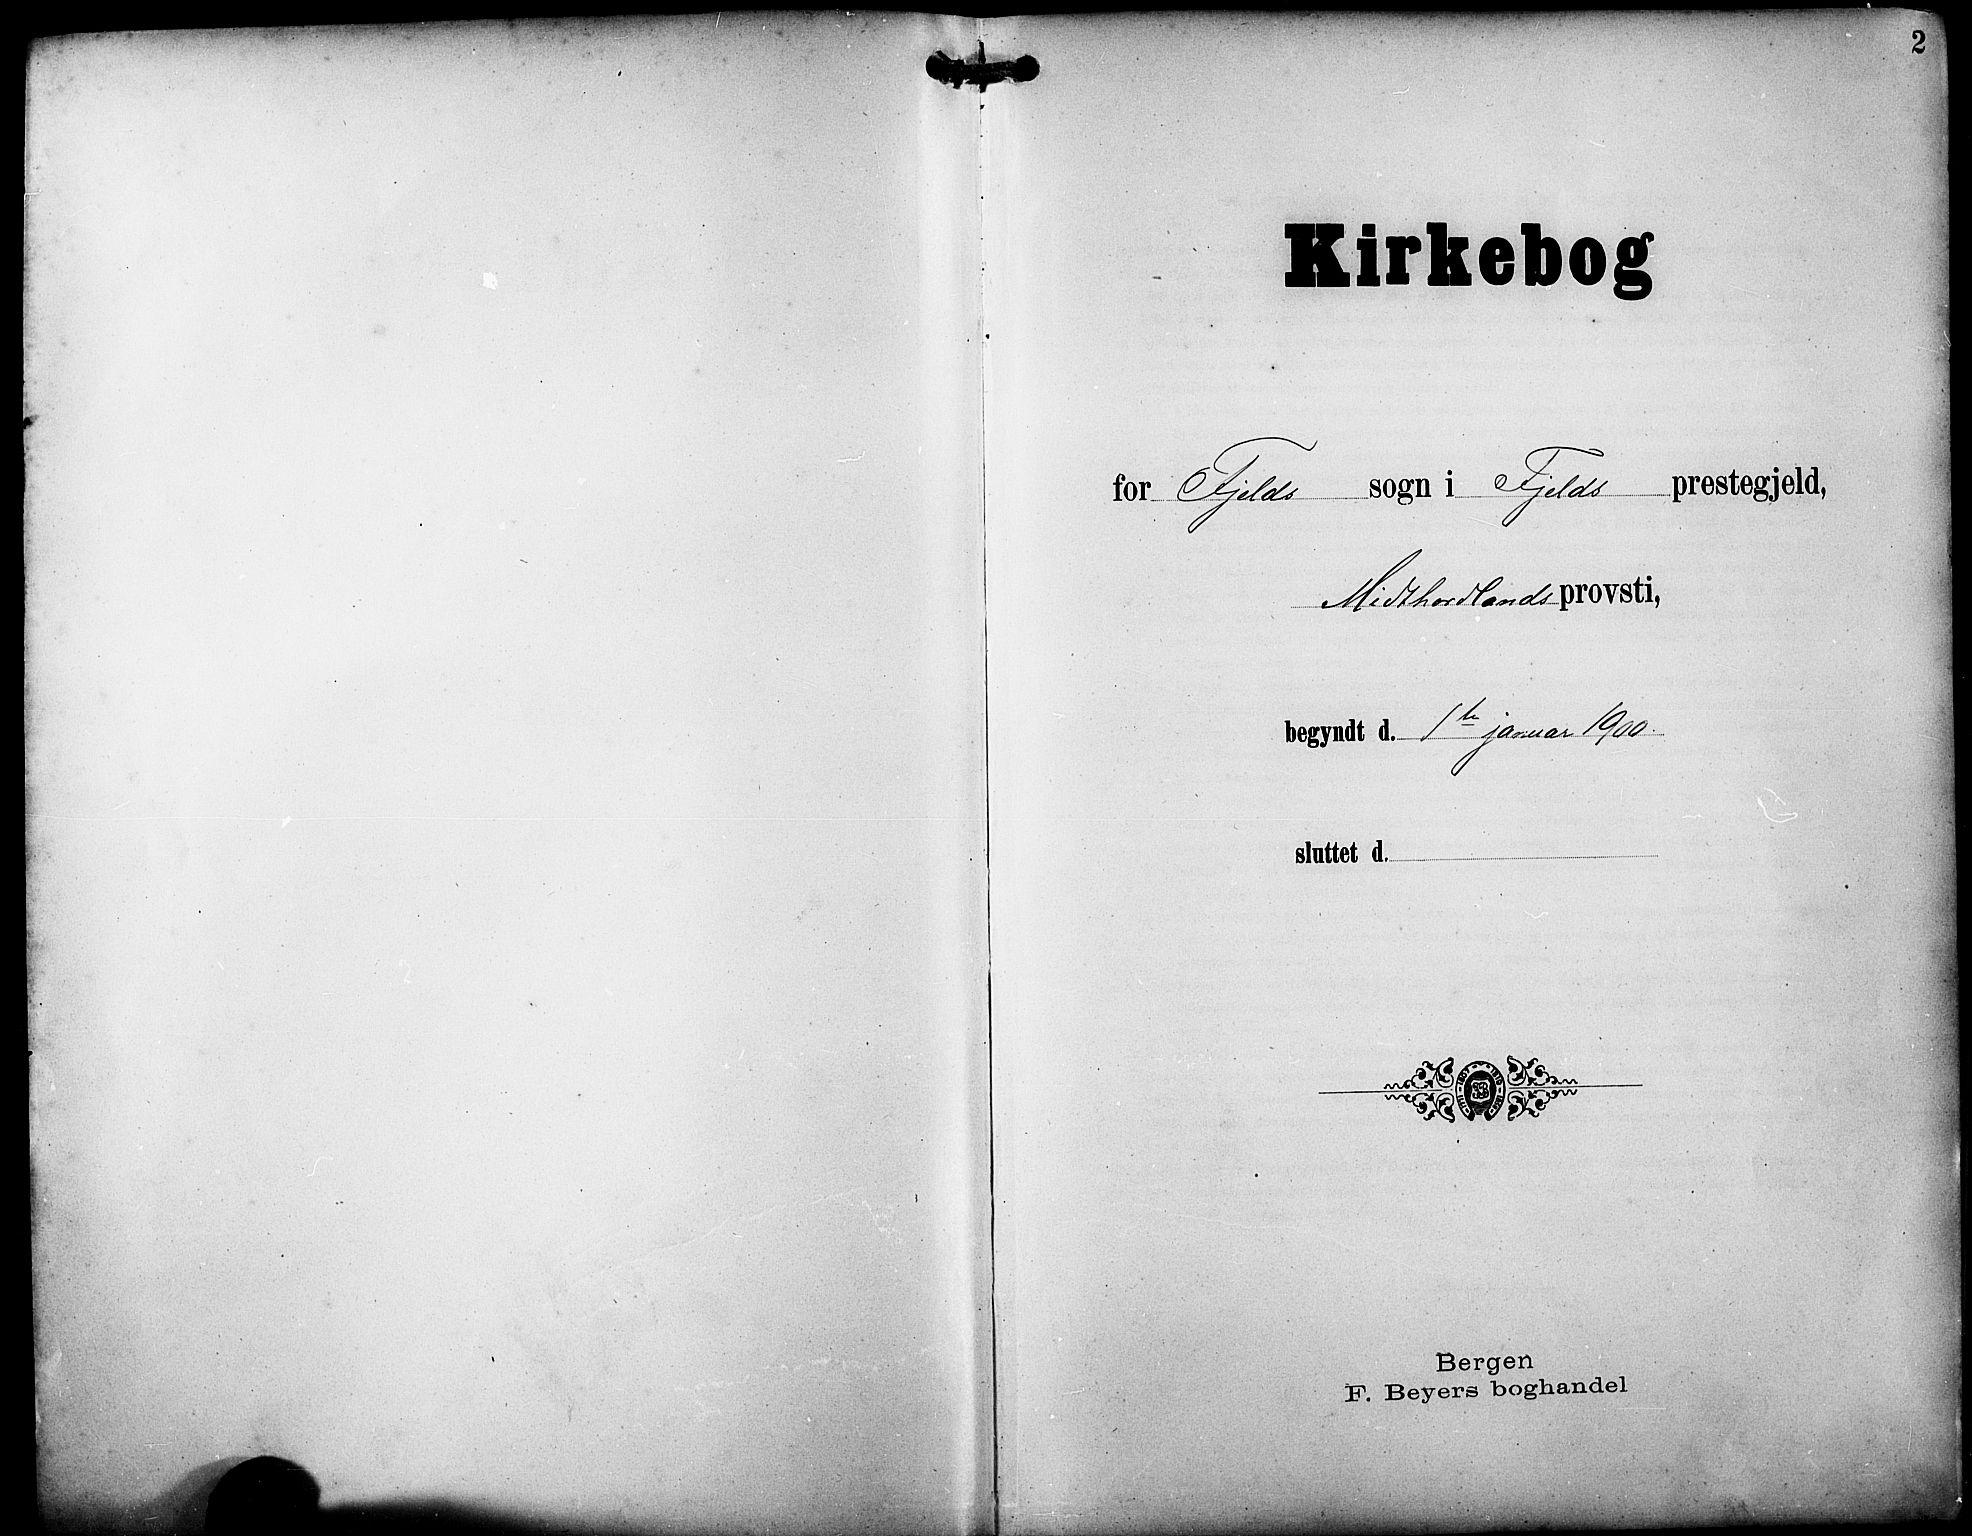 SAB, Fjell sokneprestembete, H/Hab: Klokkerbok nr. A 5, 1899-1918, s. 2